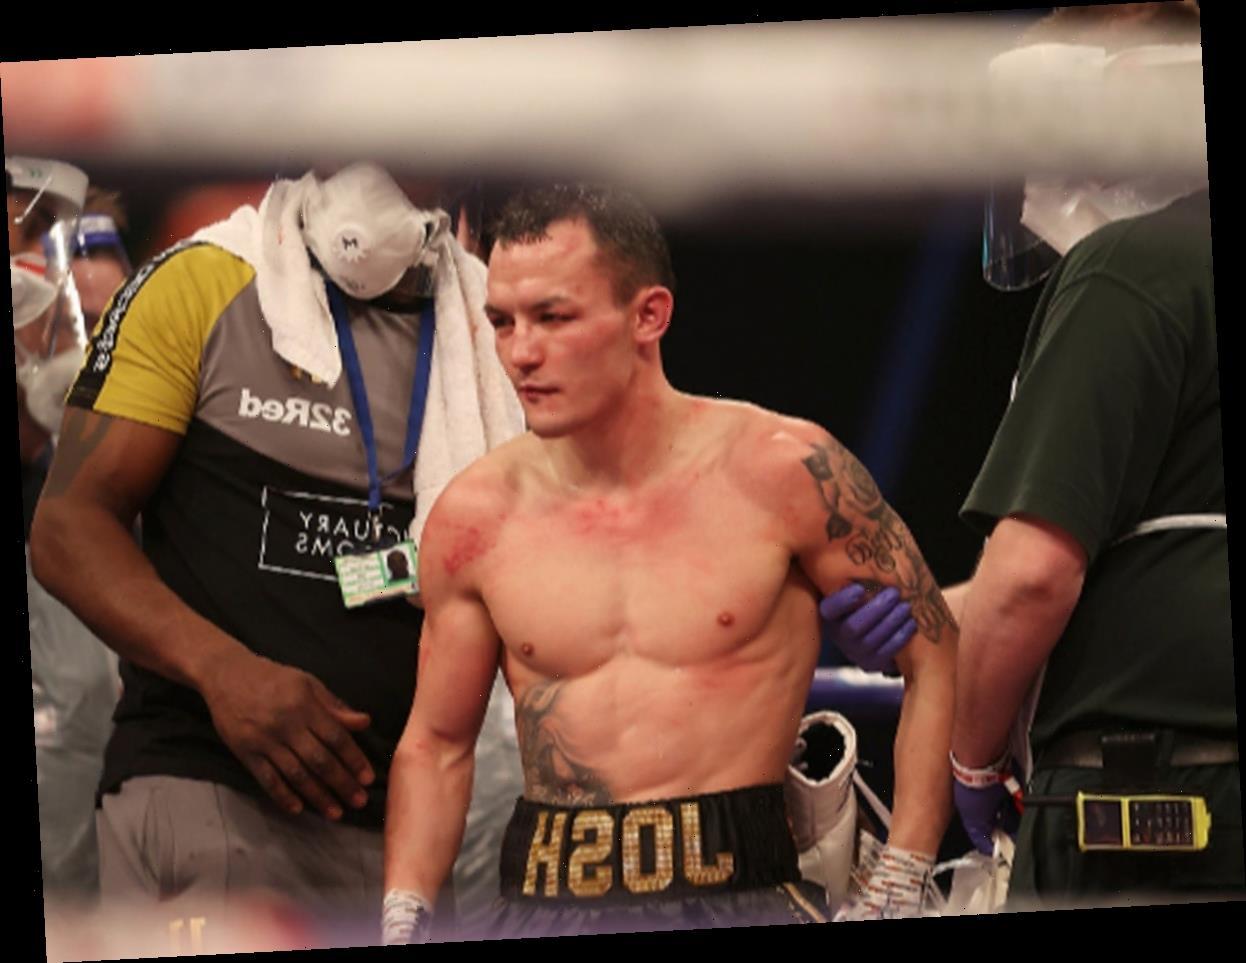 Josh Warrington targeting immediate rematch with Mauricio Lara, claims Eddie Hearn